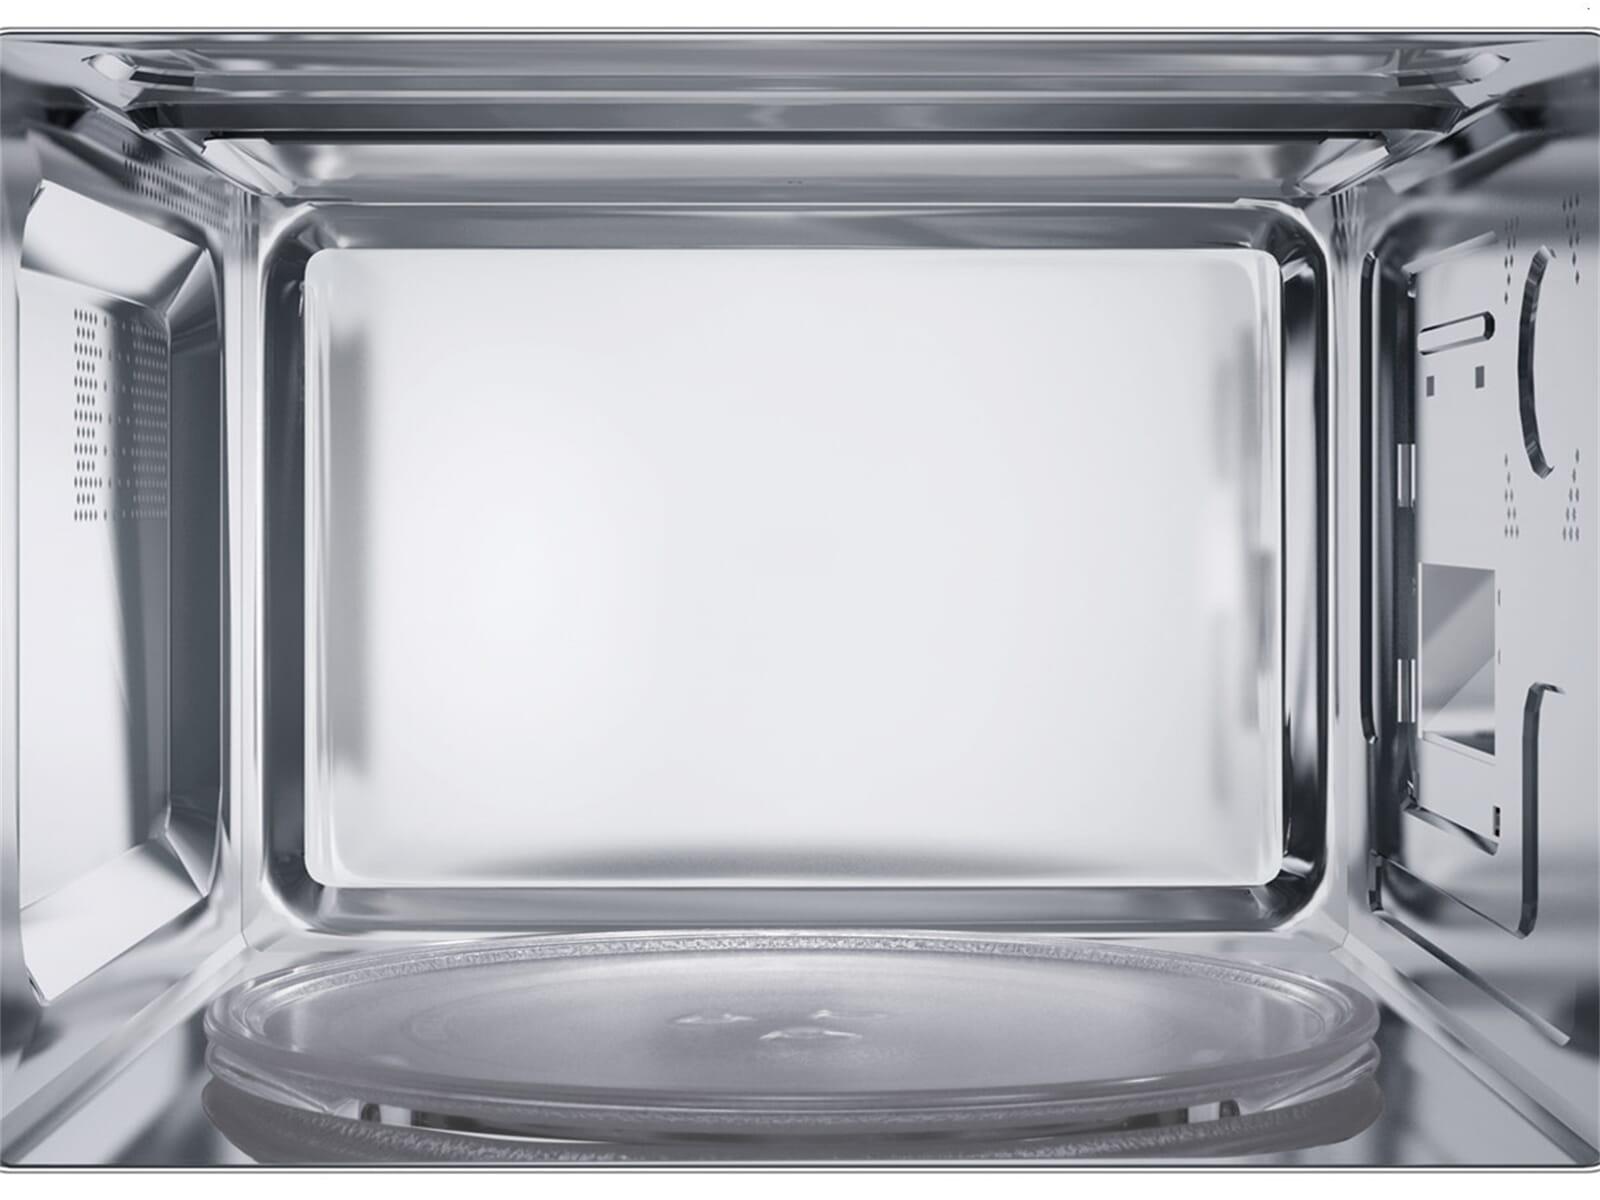 bosch hmt75m551 einbau mikrowelle edelstahl. Black Bedroom Furniture Sets. Home Design Ideas